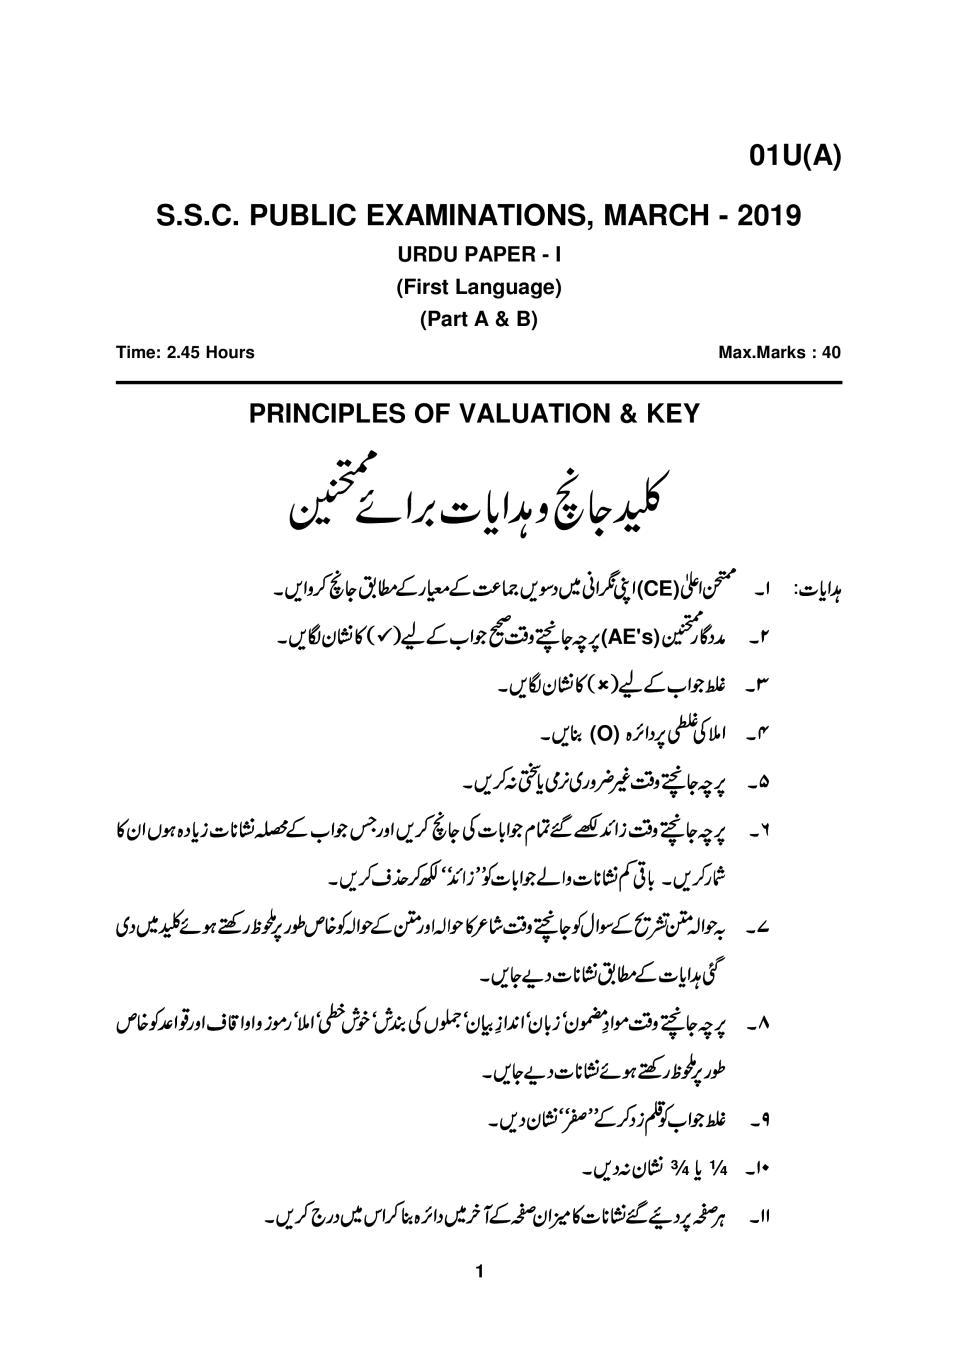 AP 10th Class Marking Scheme 2019 Urdu - Paper 1 (1st Language) - Page 1